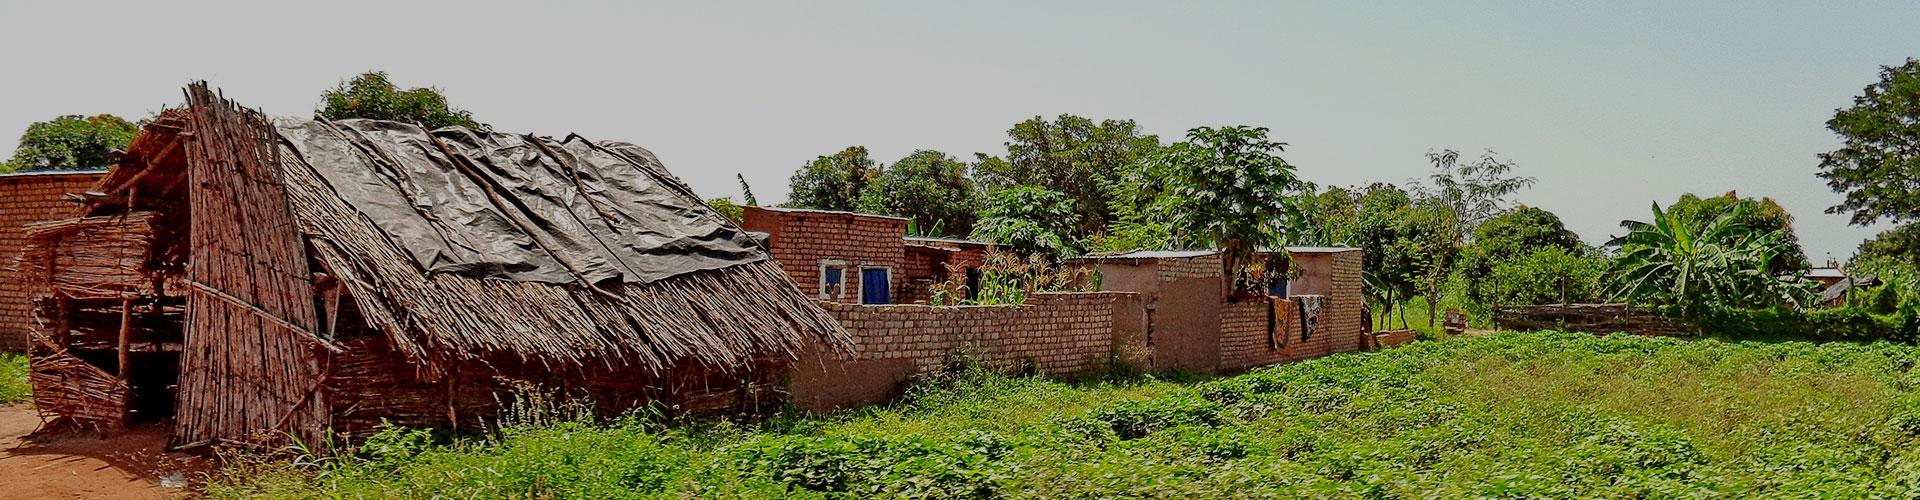 Landmark photograph of Chad